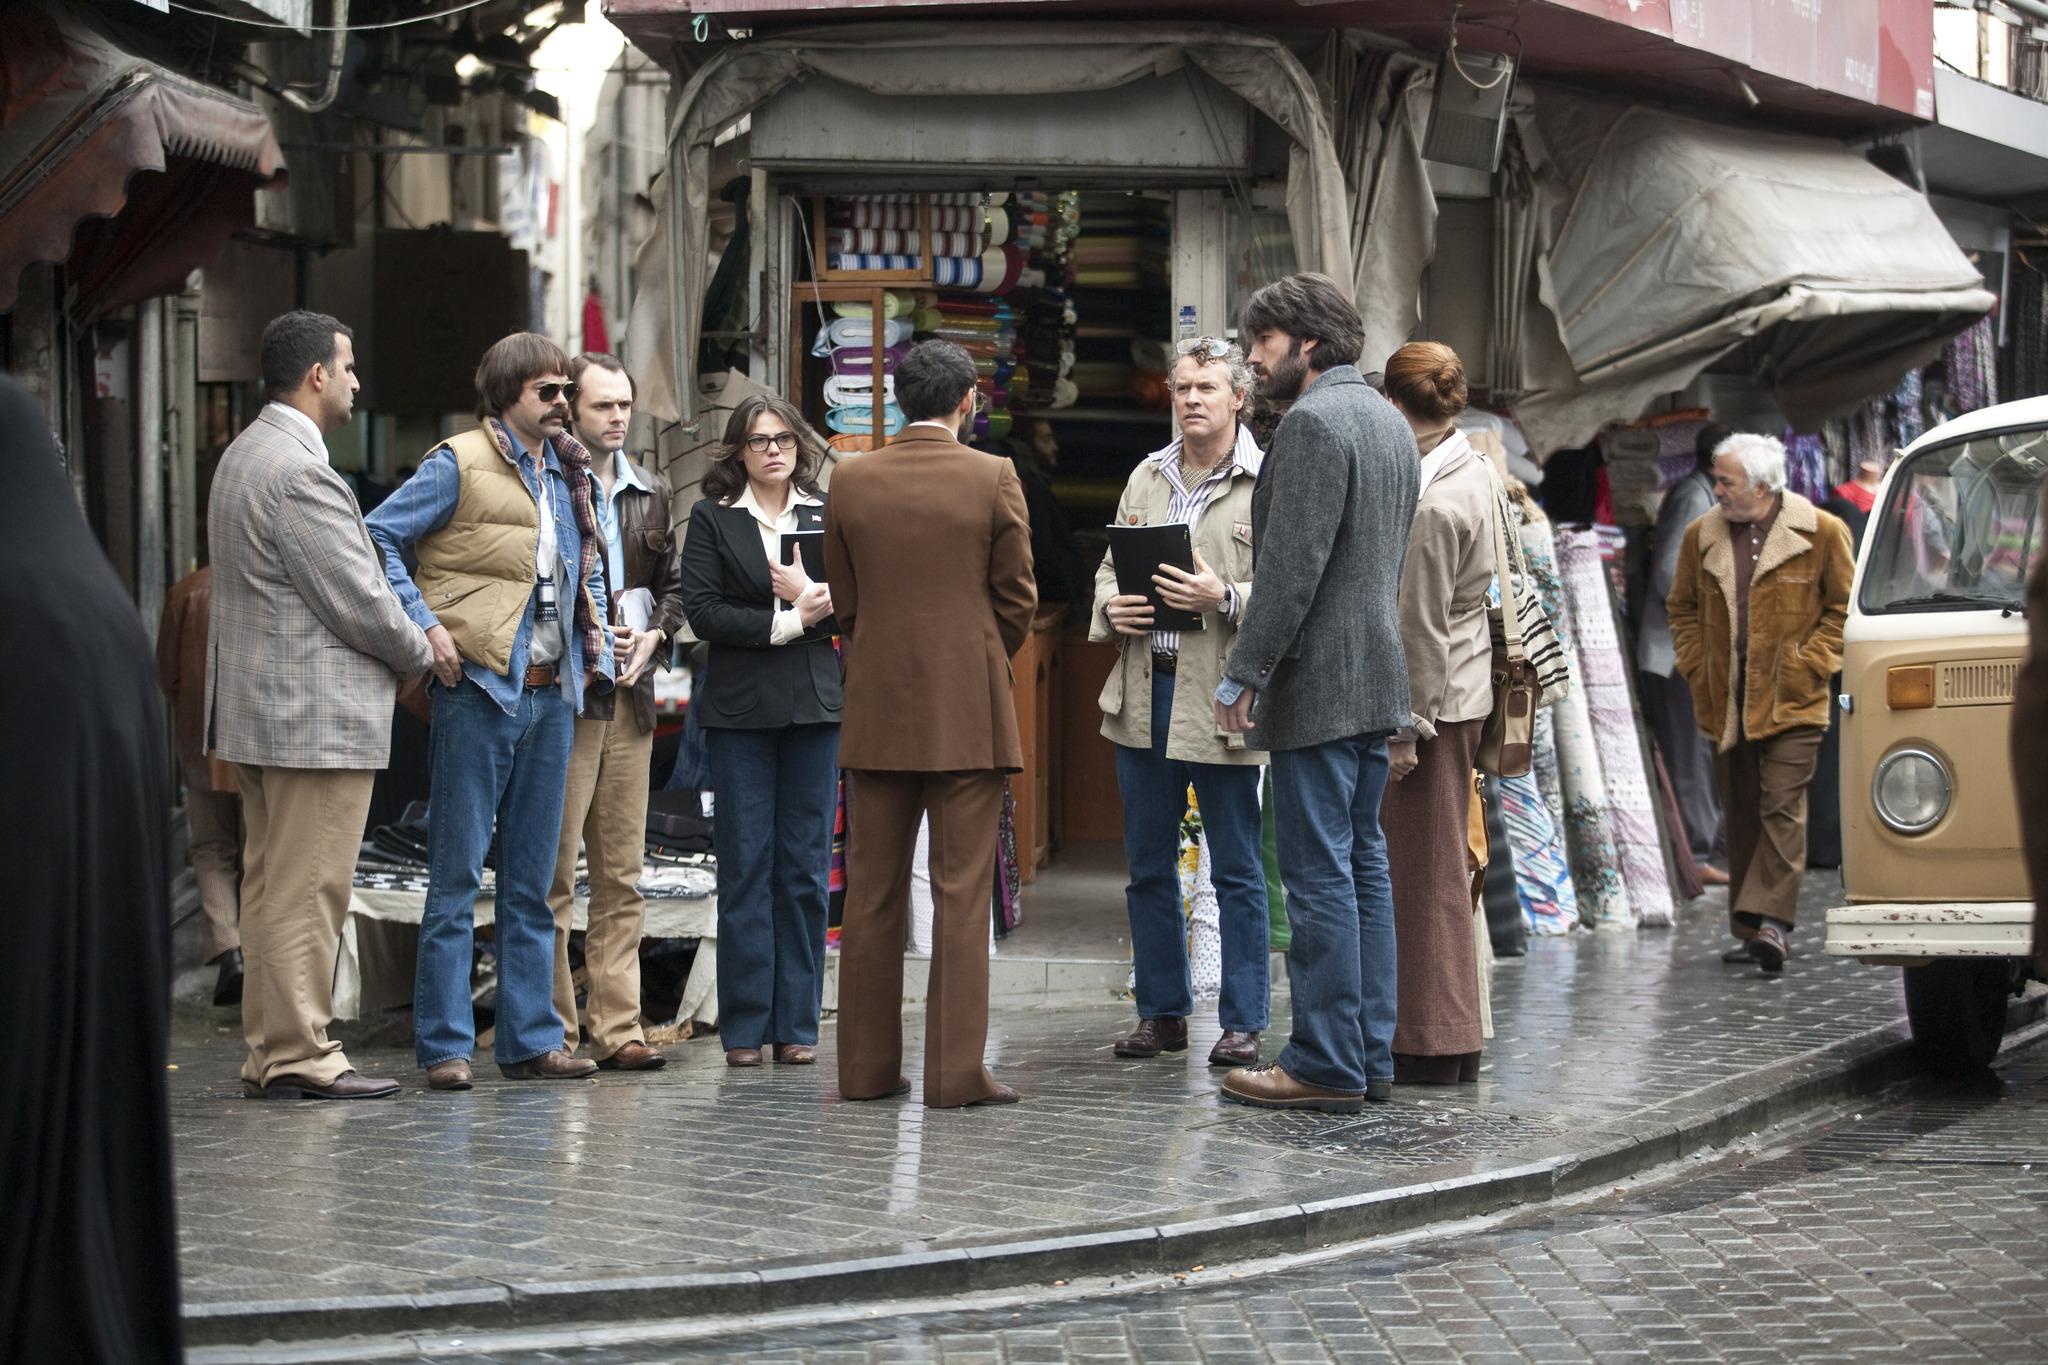 Ben Affleck, Tate Donovan, Rory Cochrane, Clea DuVall, and Christopher Denham in Argo (2012)